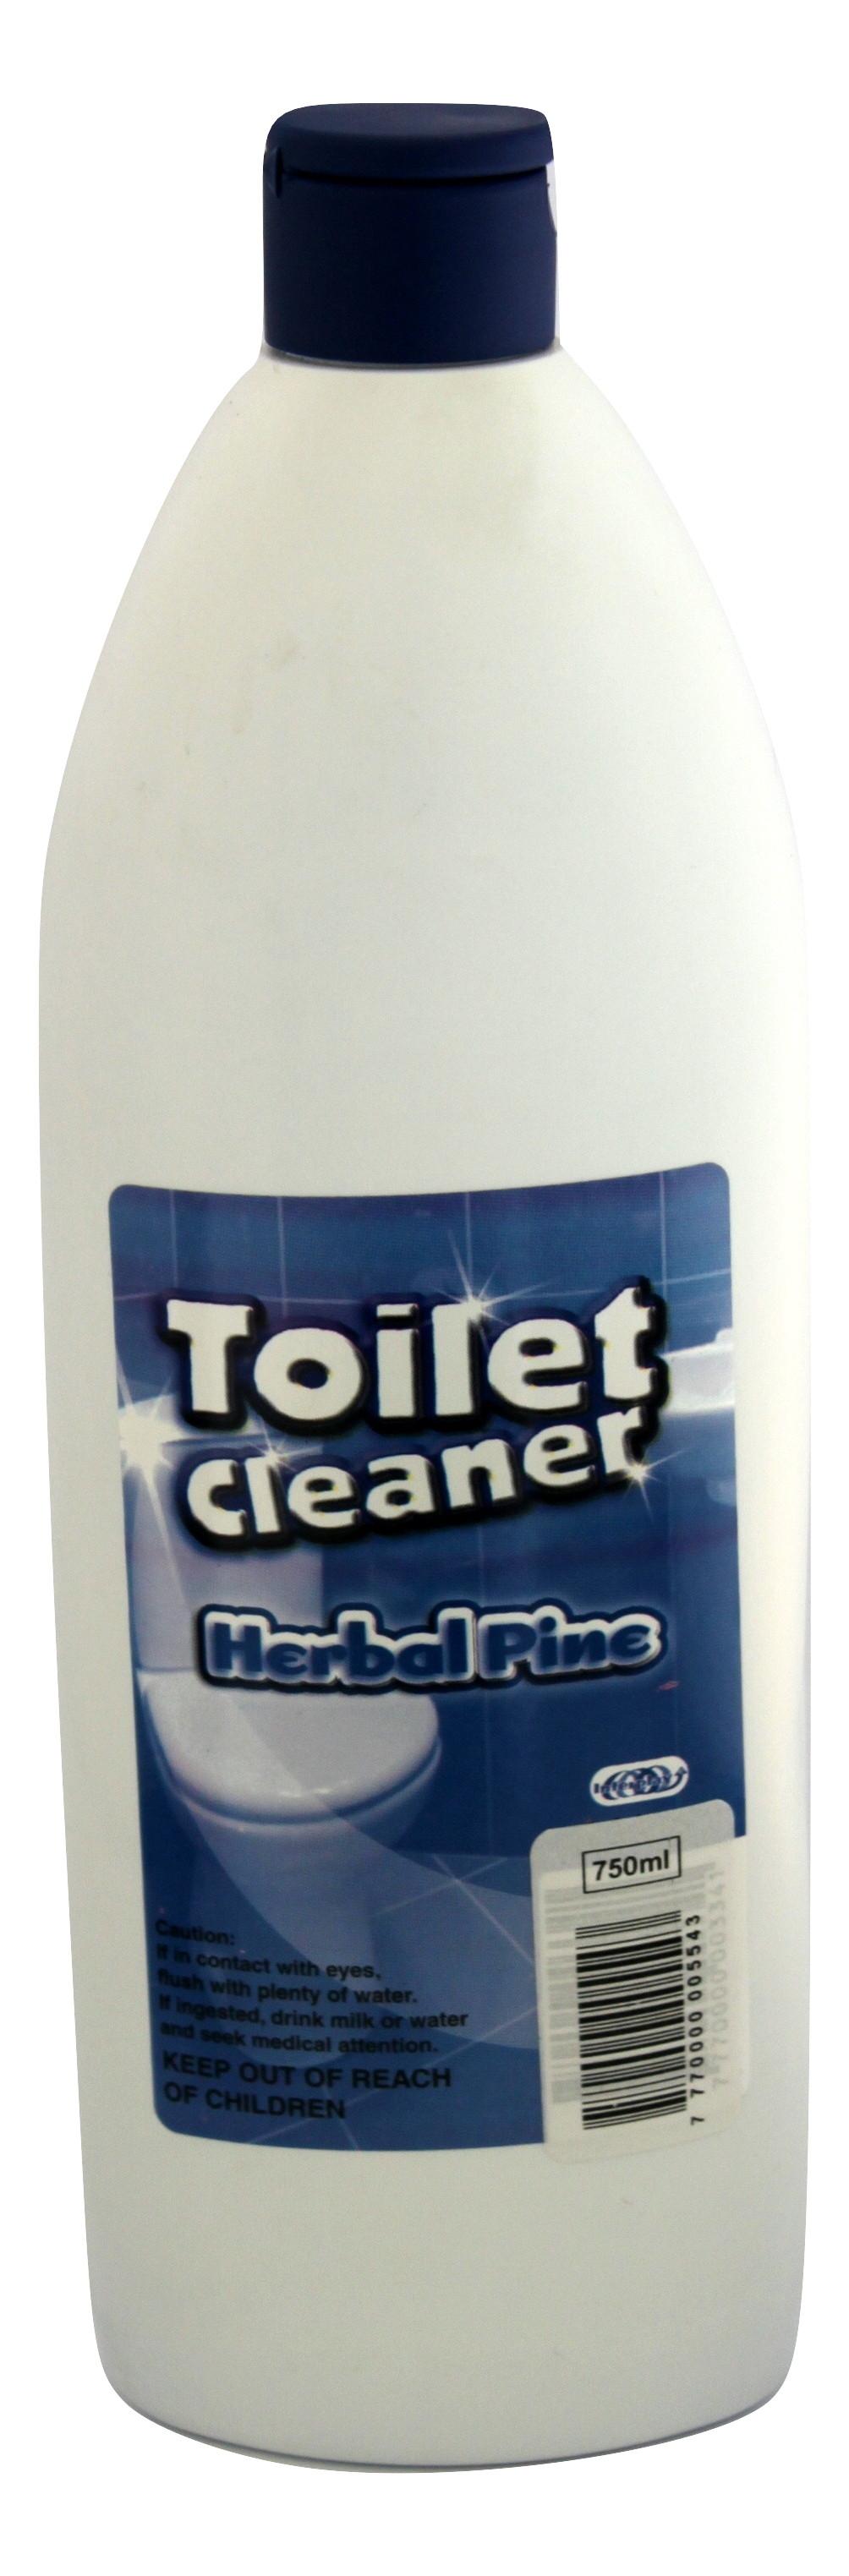 toilet-cleaner-similar-to-toilet-duck